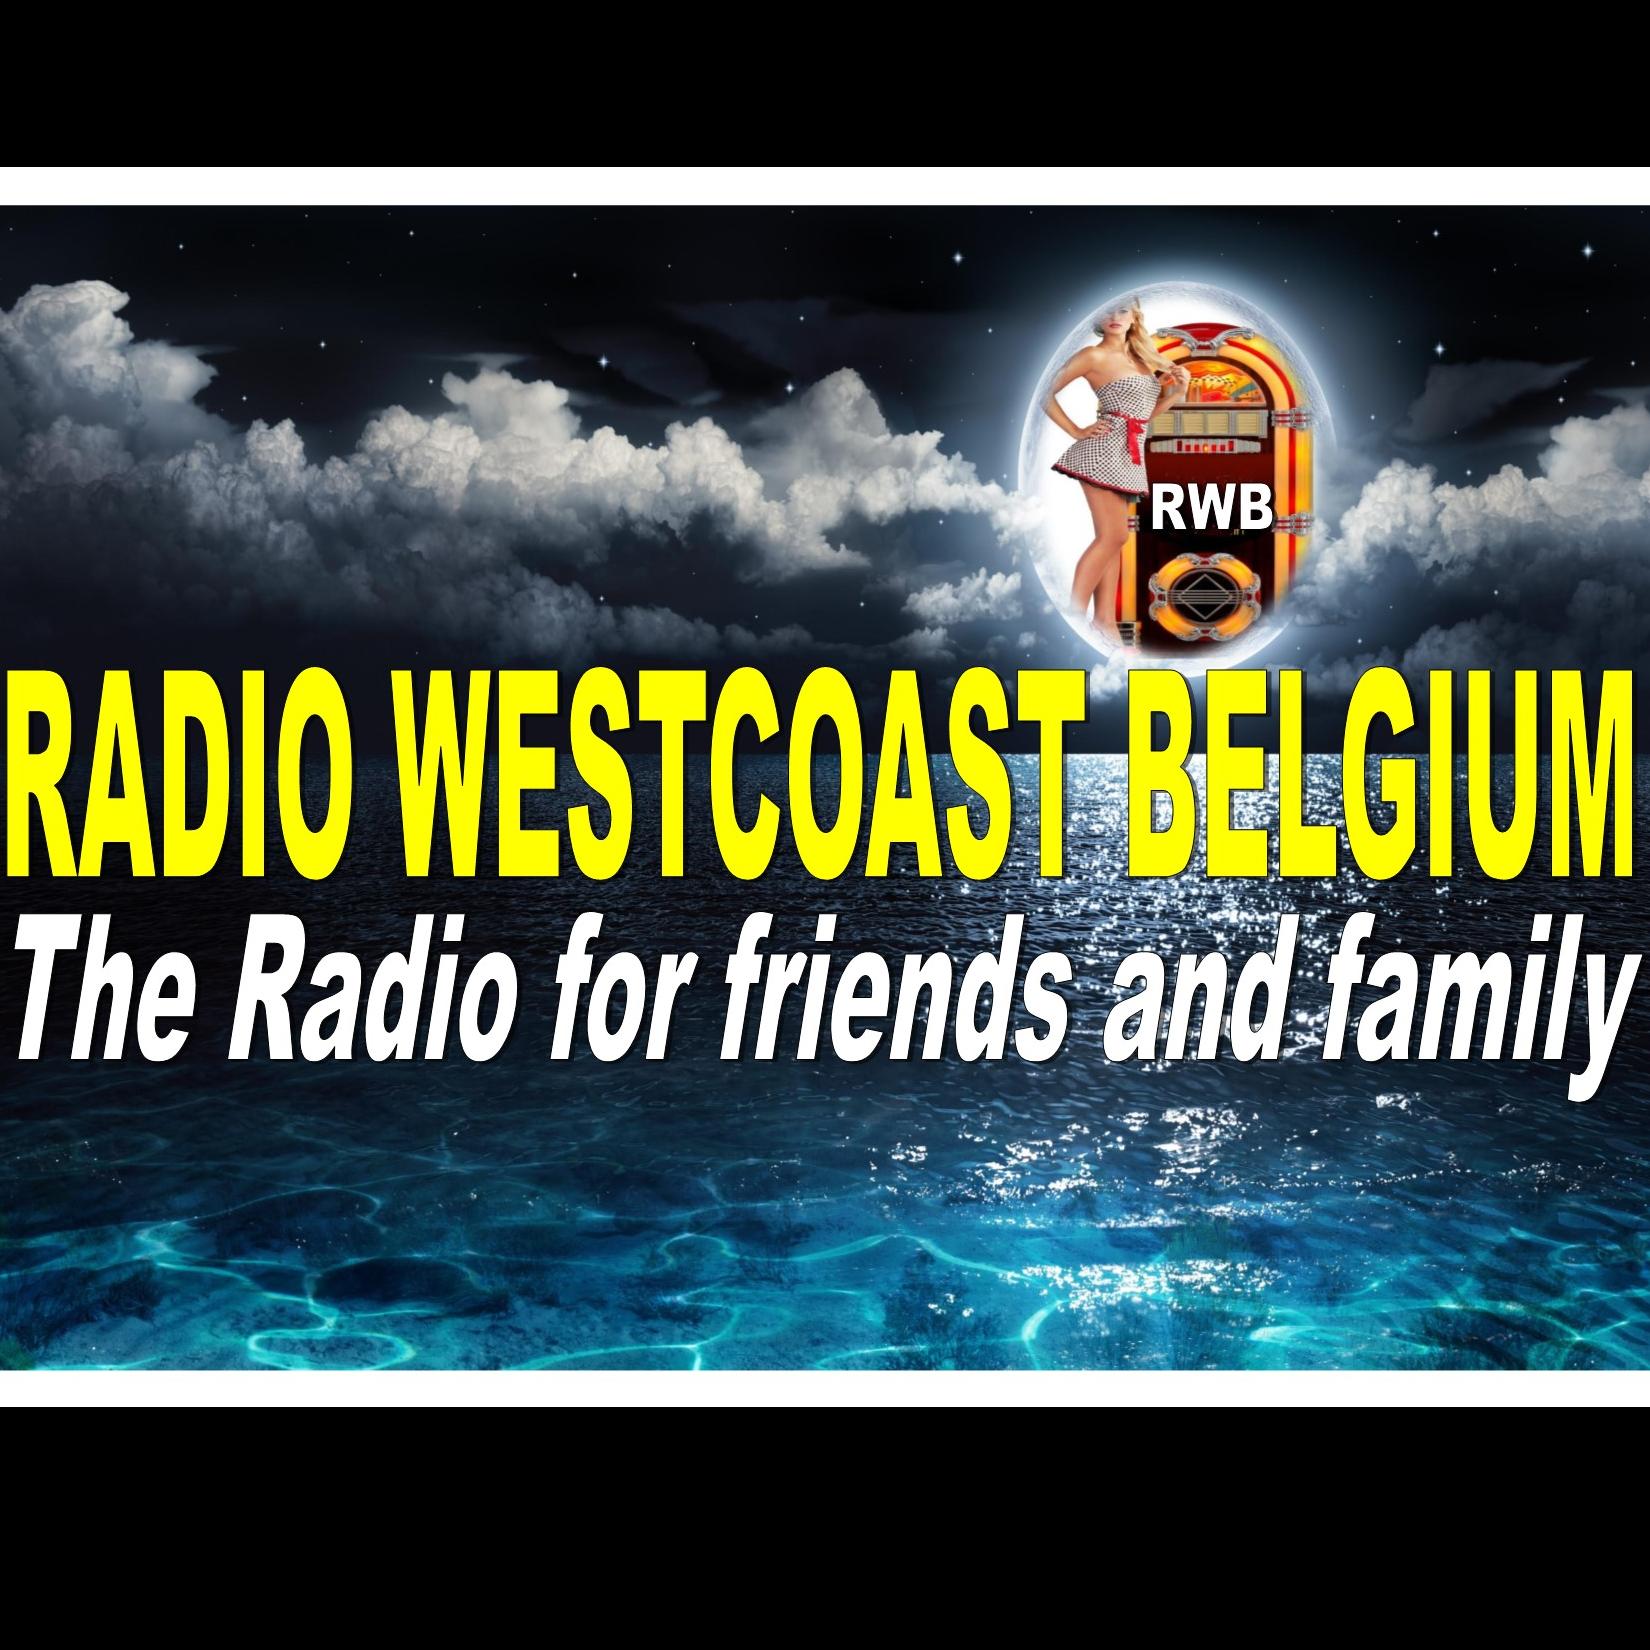 Radio Westcoast Belgium